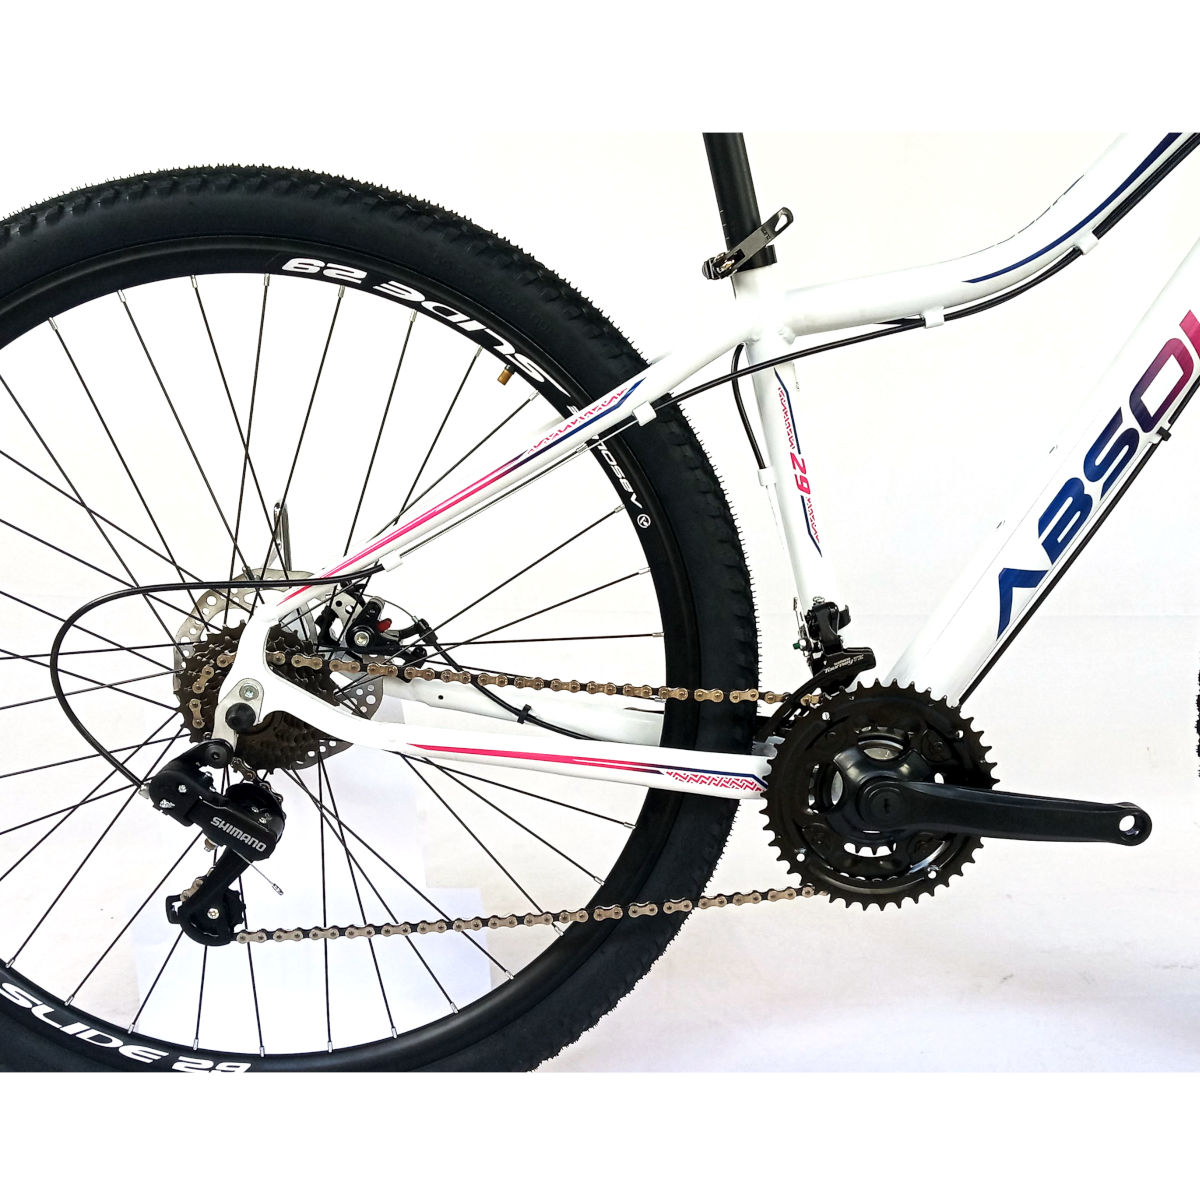 Bicicleta Absolute Hera Aro 29 Feminina